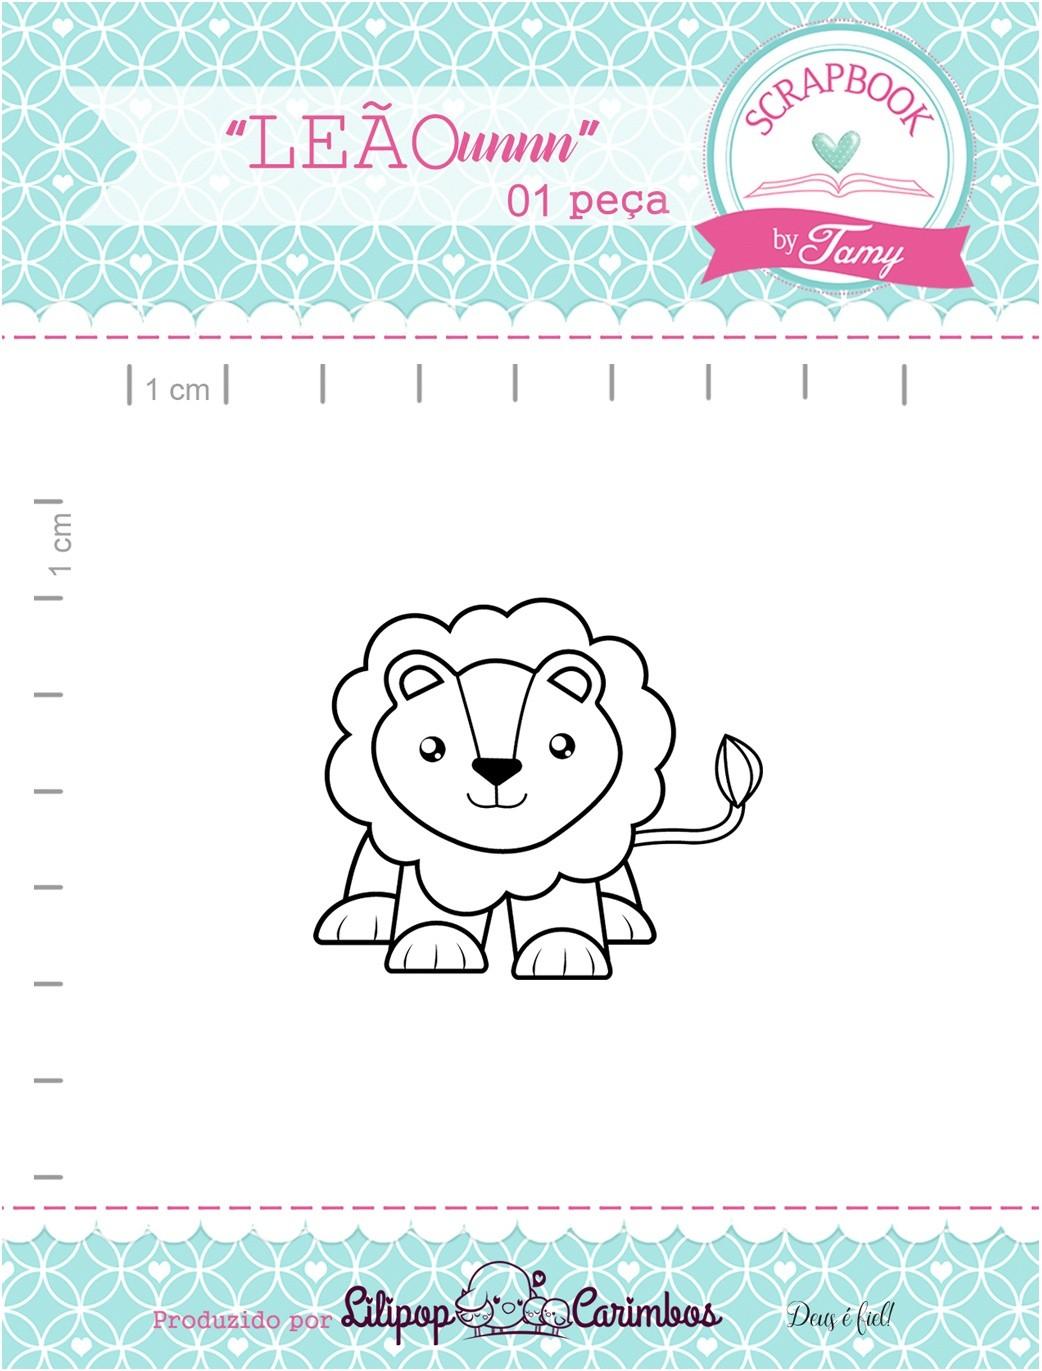 Carimbo Leão  - Scrapbook by Tamy